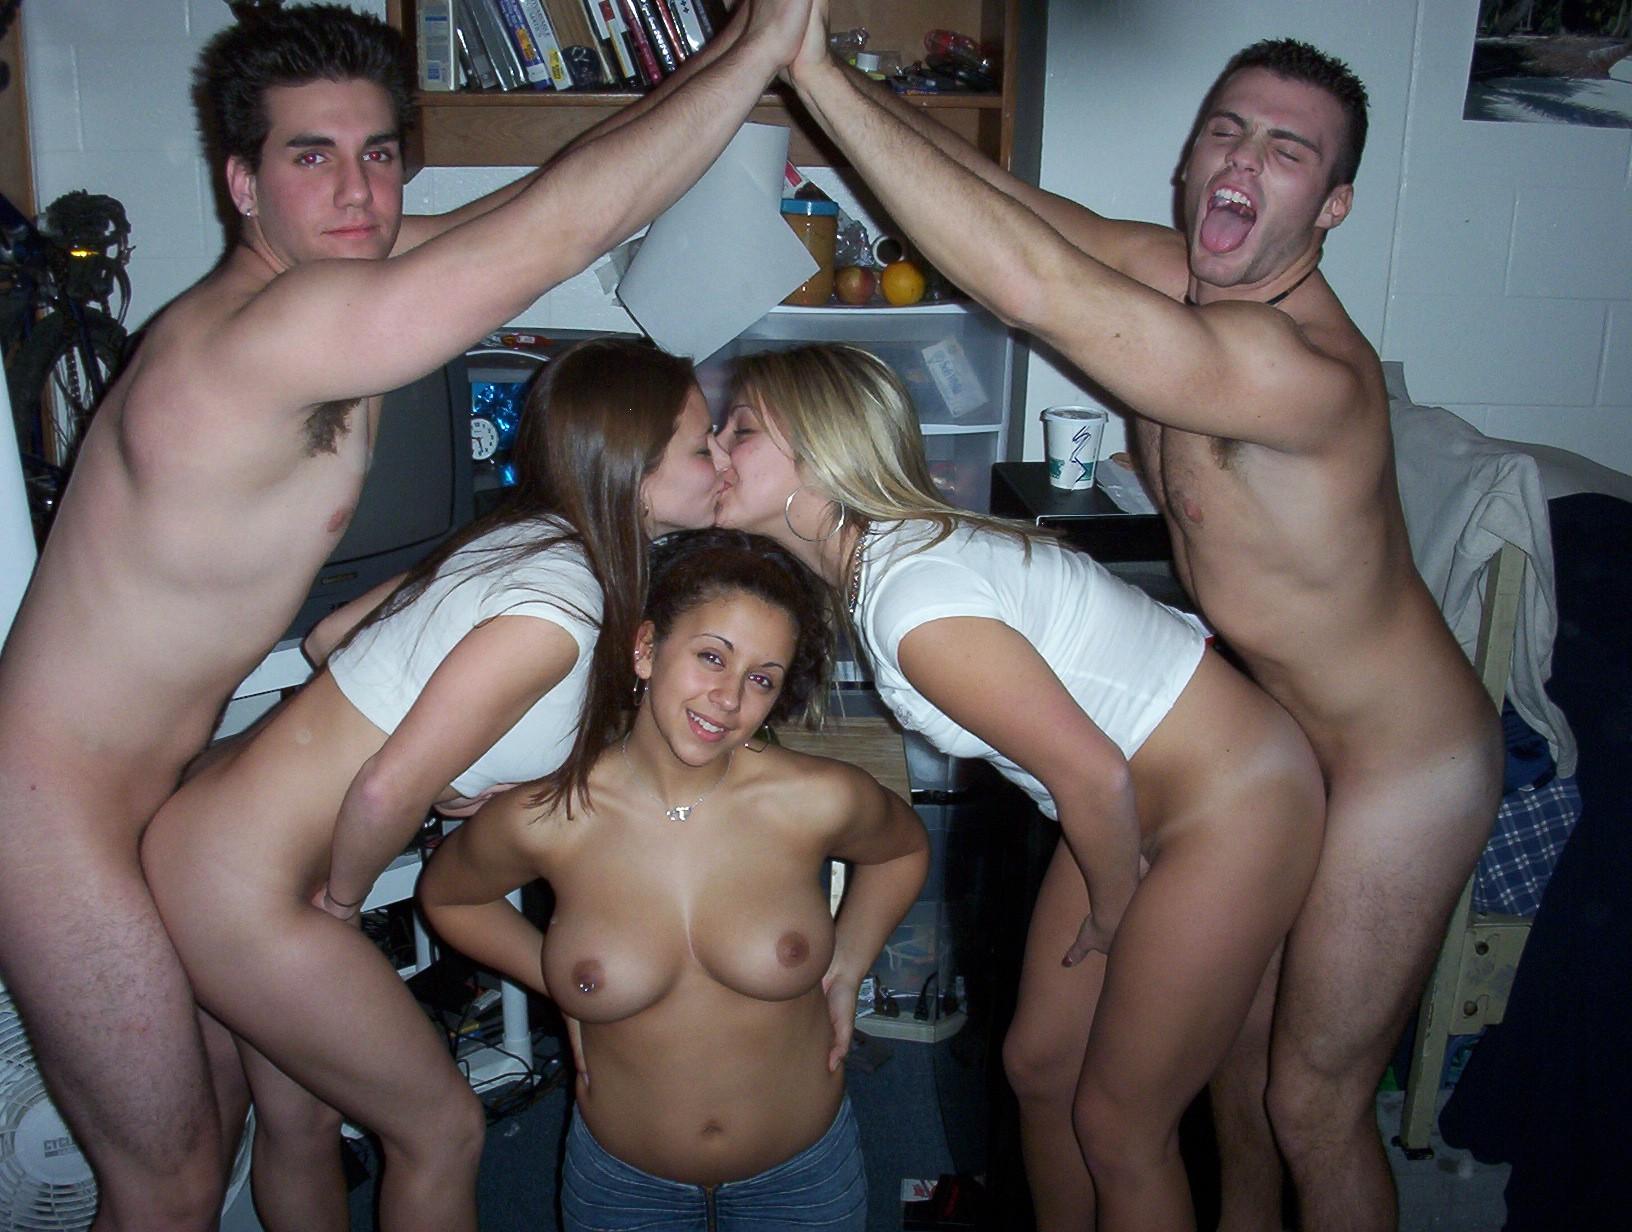 San diego college girls nude think, that